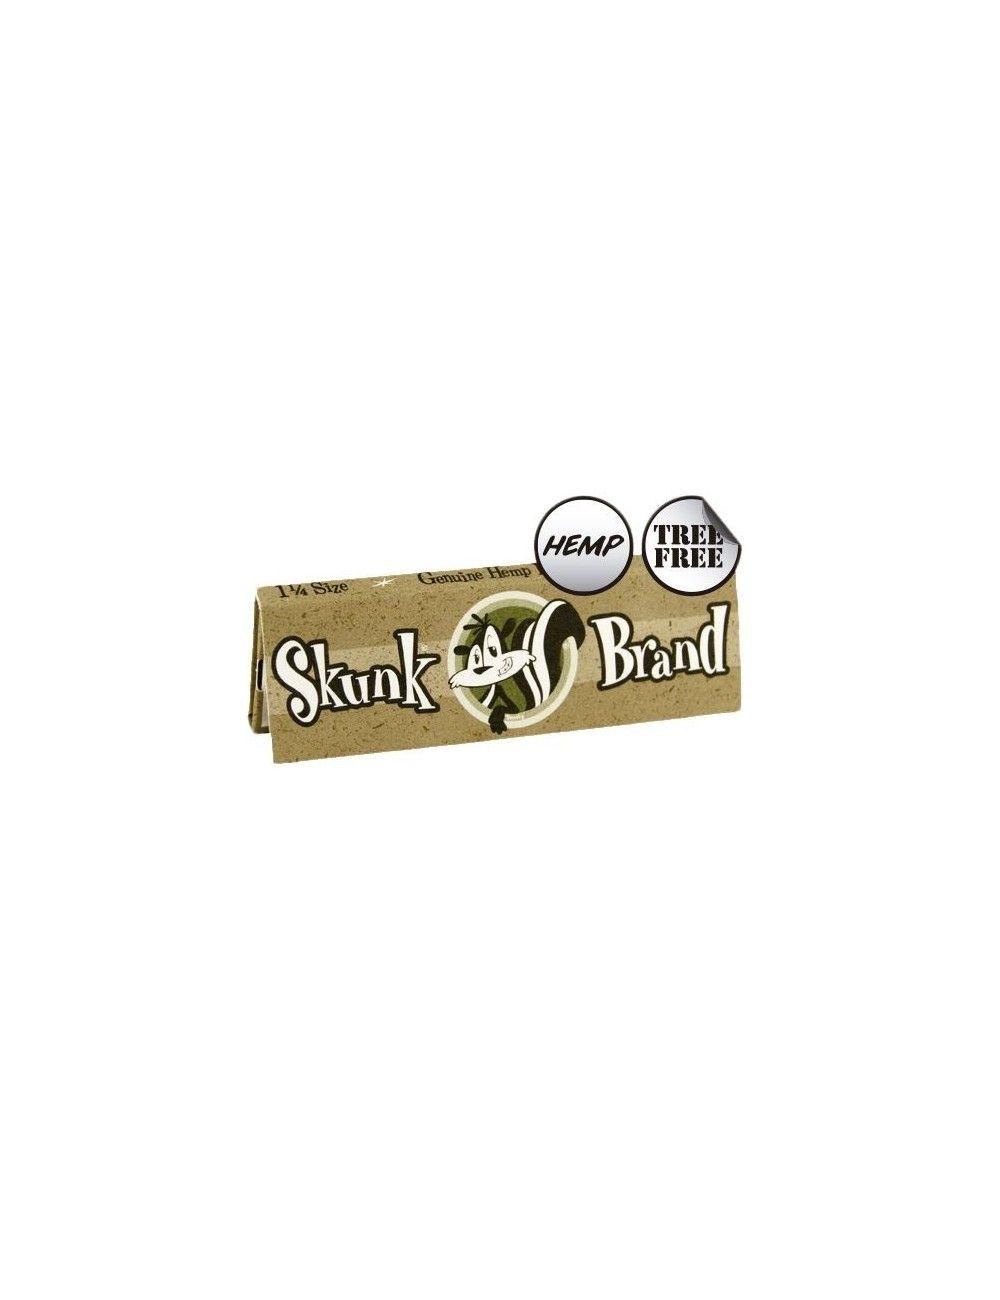 Skunk Brand 1 1/4